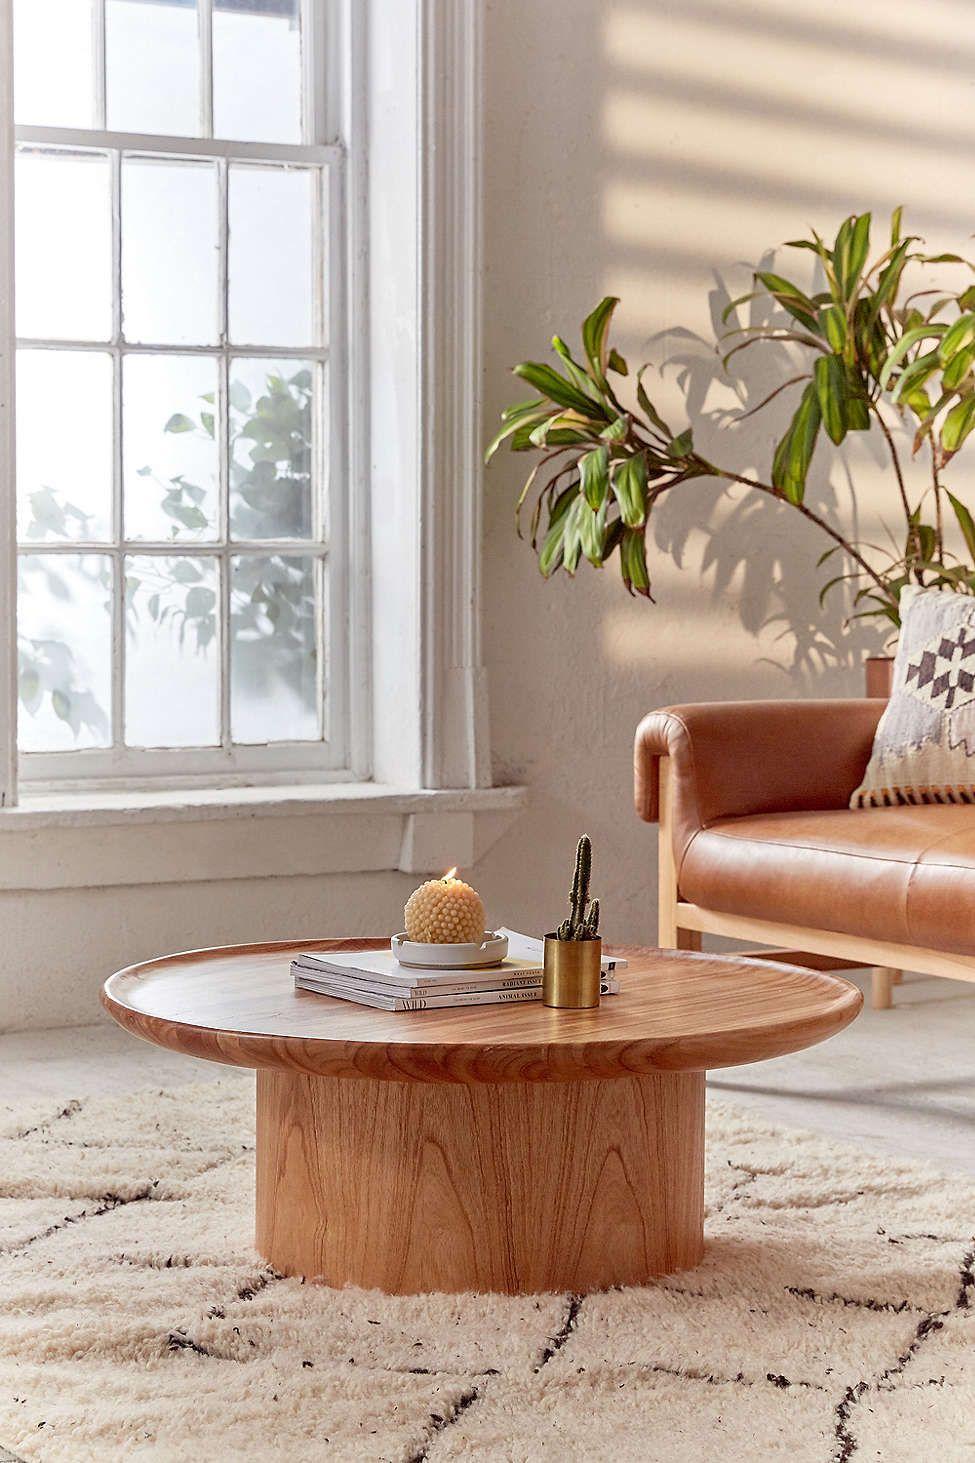 Matro Wood Coffee Table Round Coffee Table Modern Coffee Table Coffee Table Wood [ 1463 x 975 Pixel ]